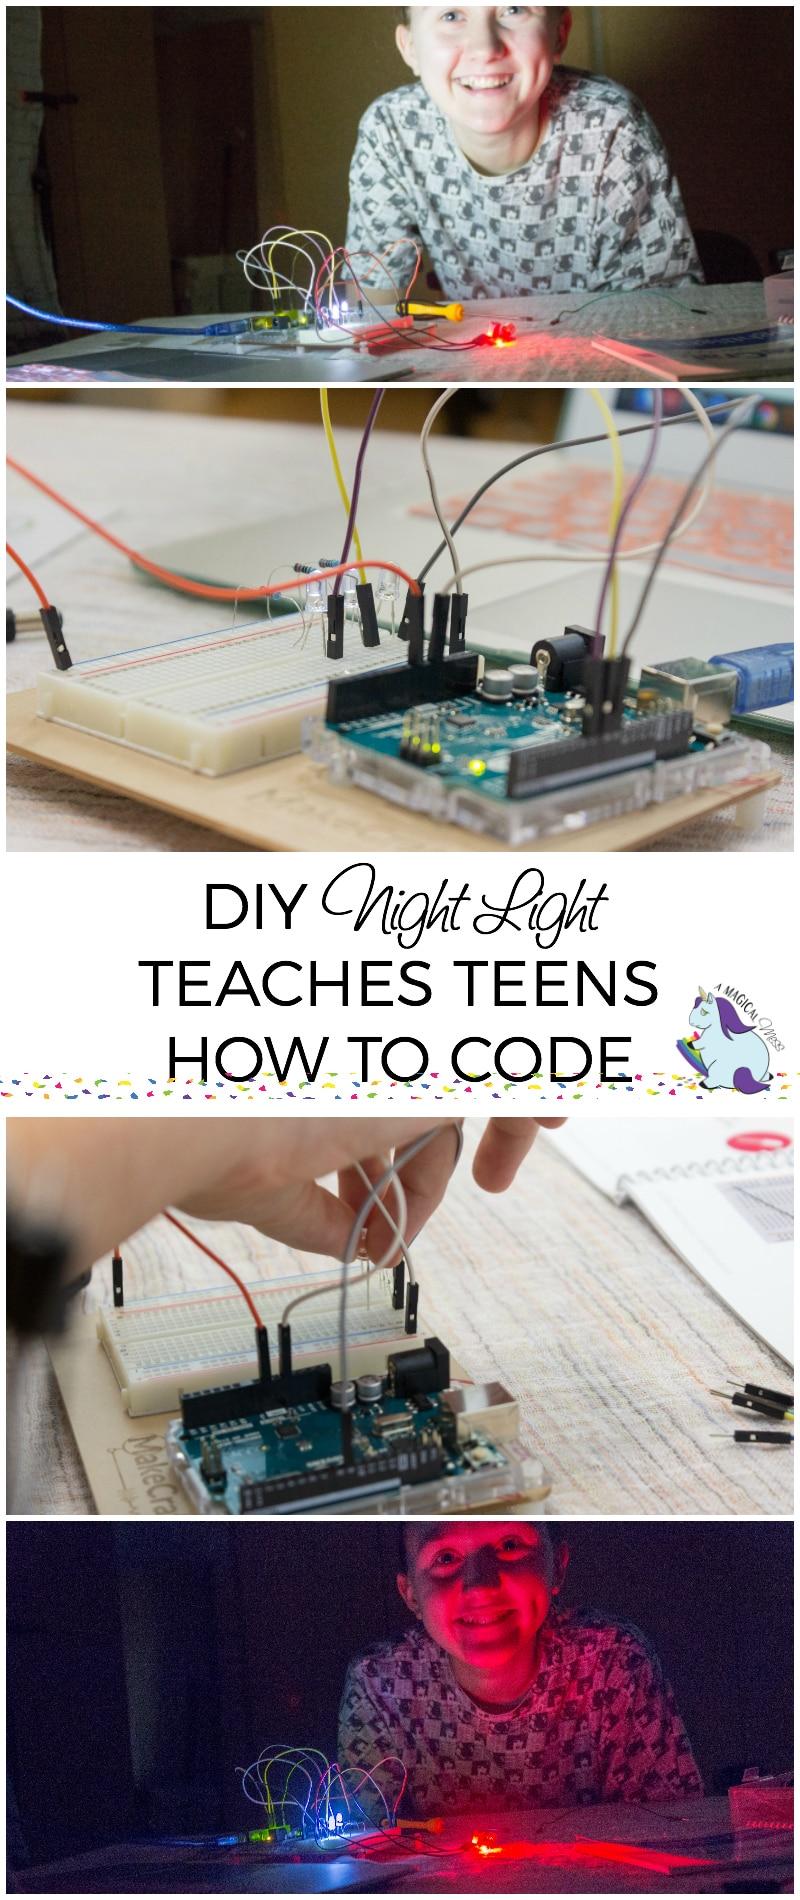 DIY Night Light Teaches Teens How To Code